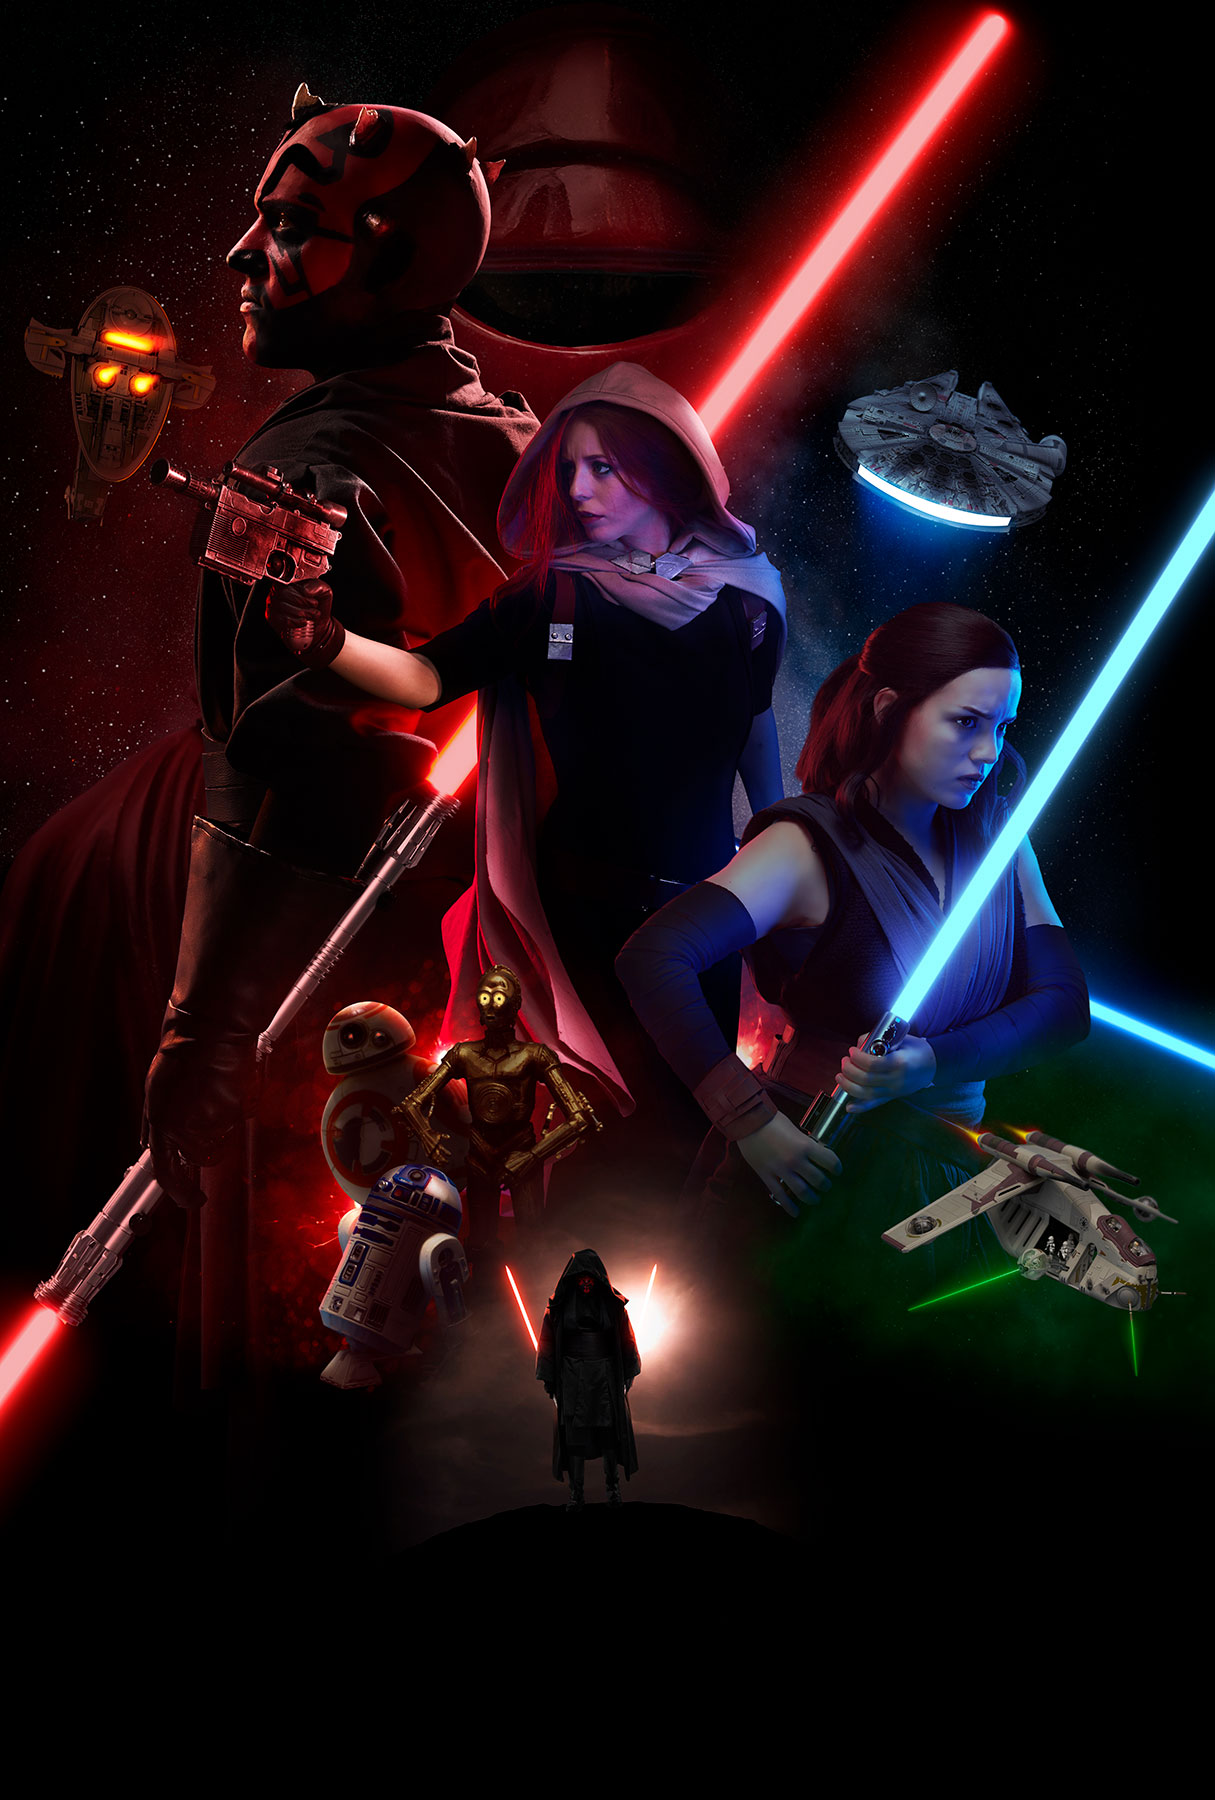 Sayanoff Arthur Star Wars Poster 02 13